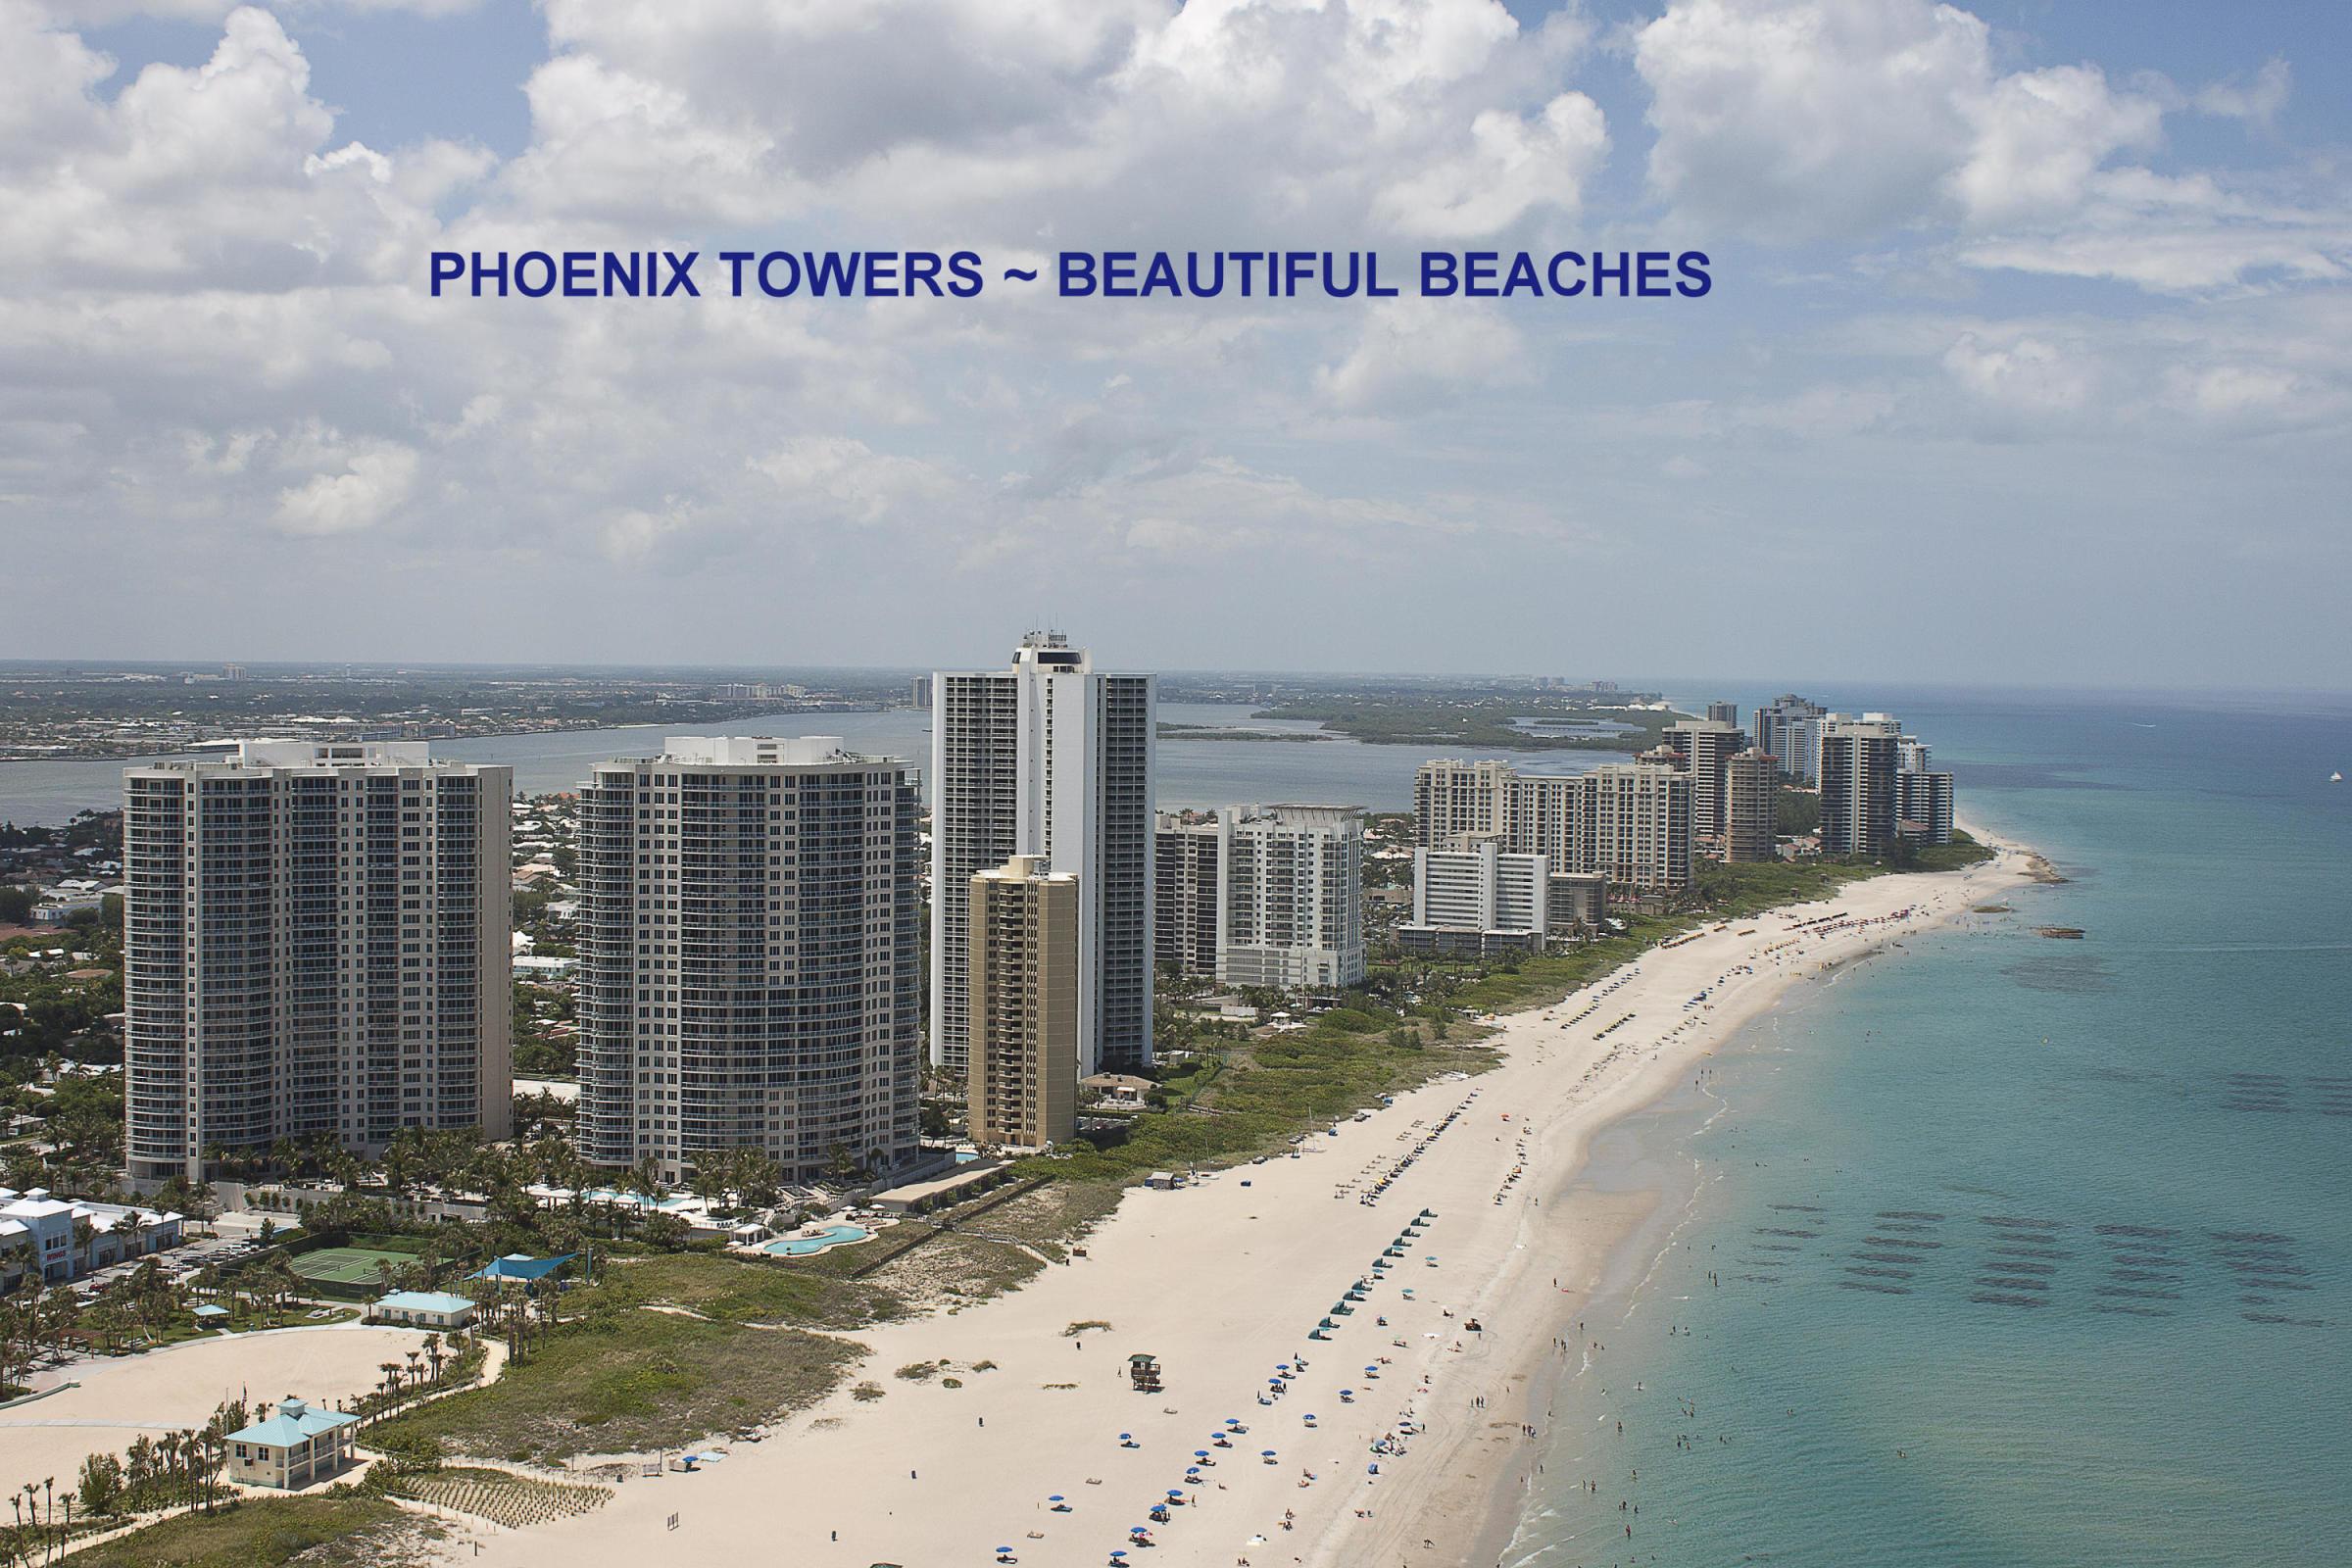 PHOENIX TOWERS REAL ESTATE